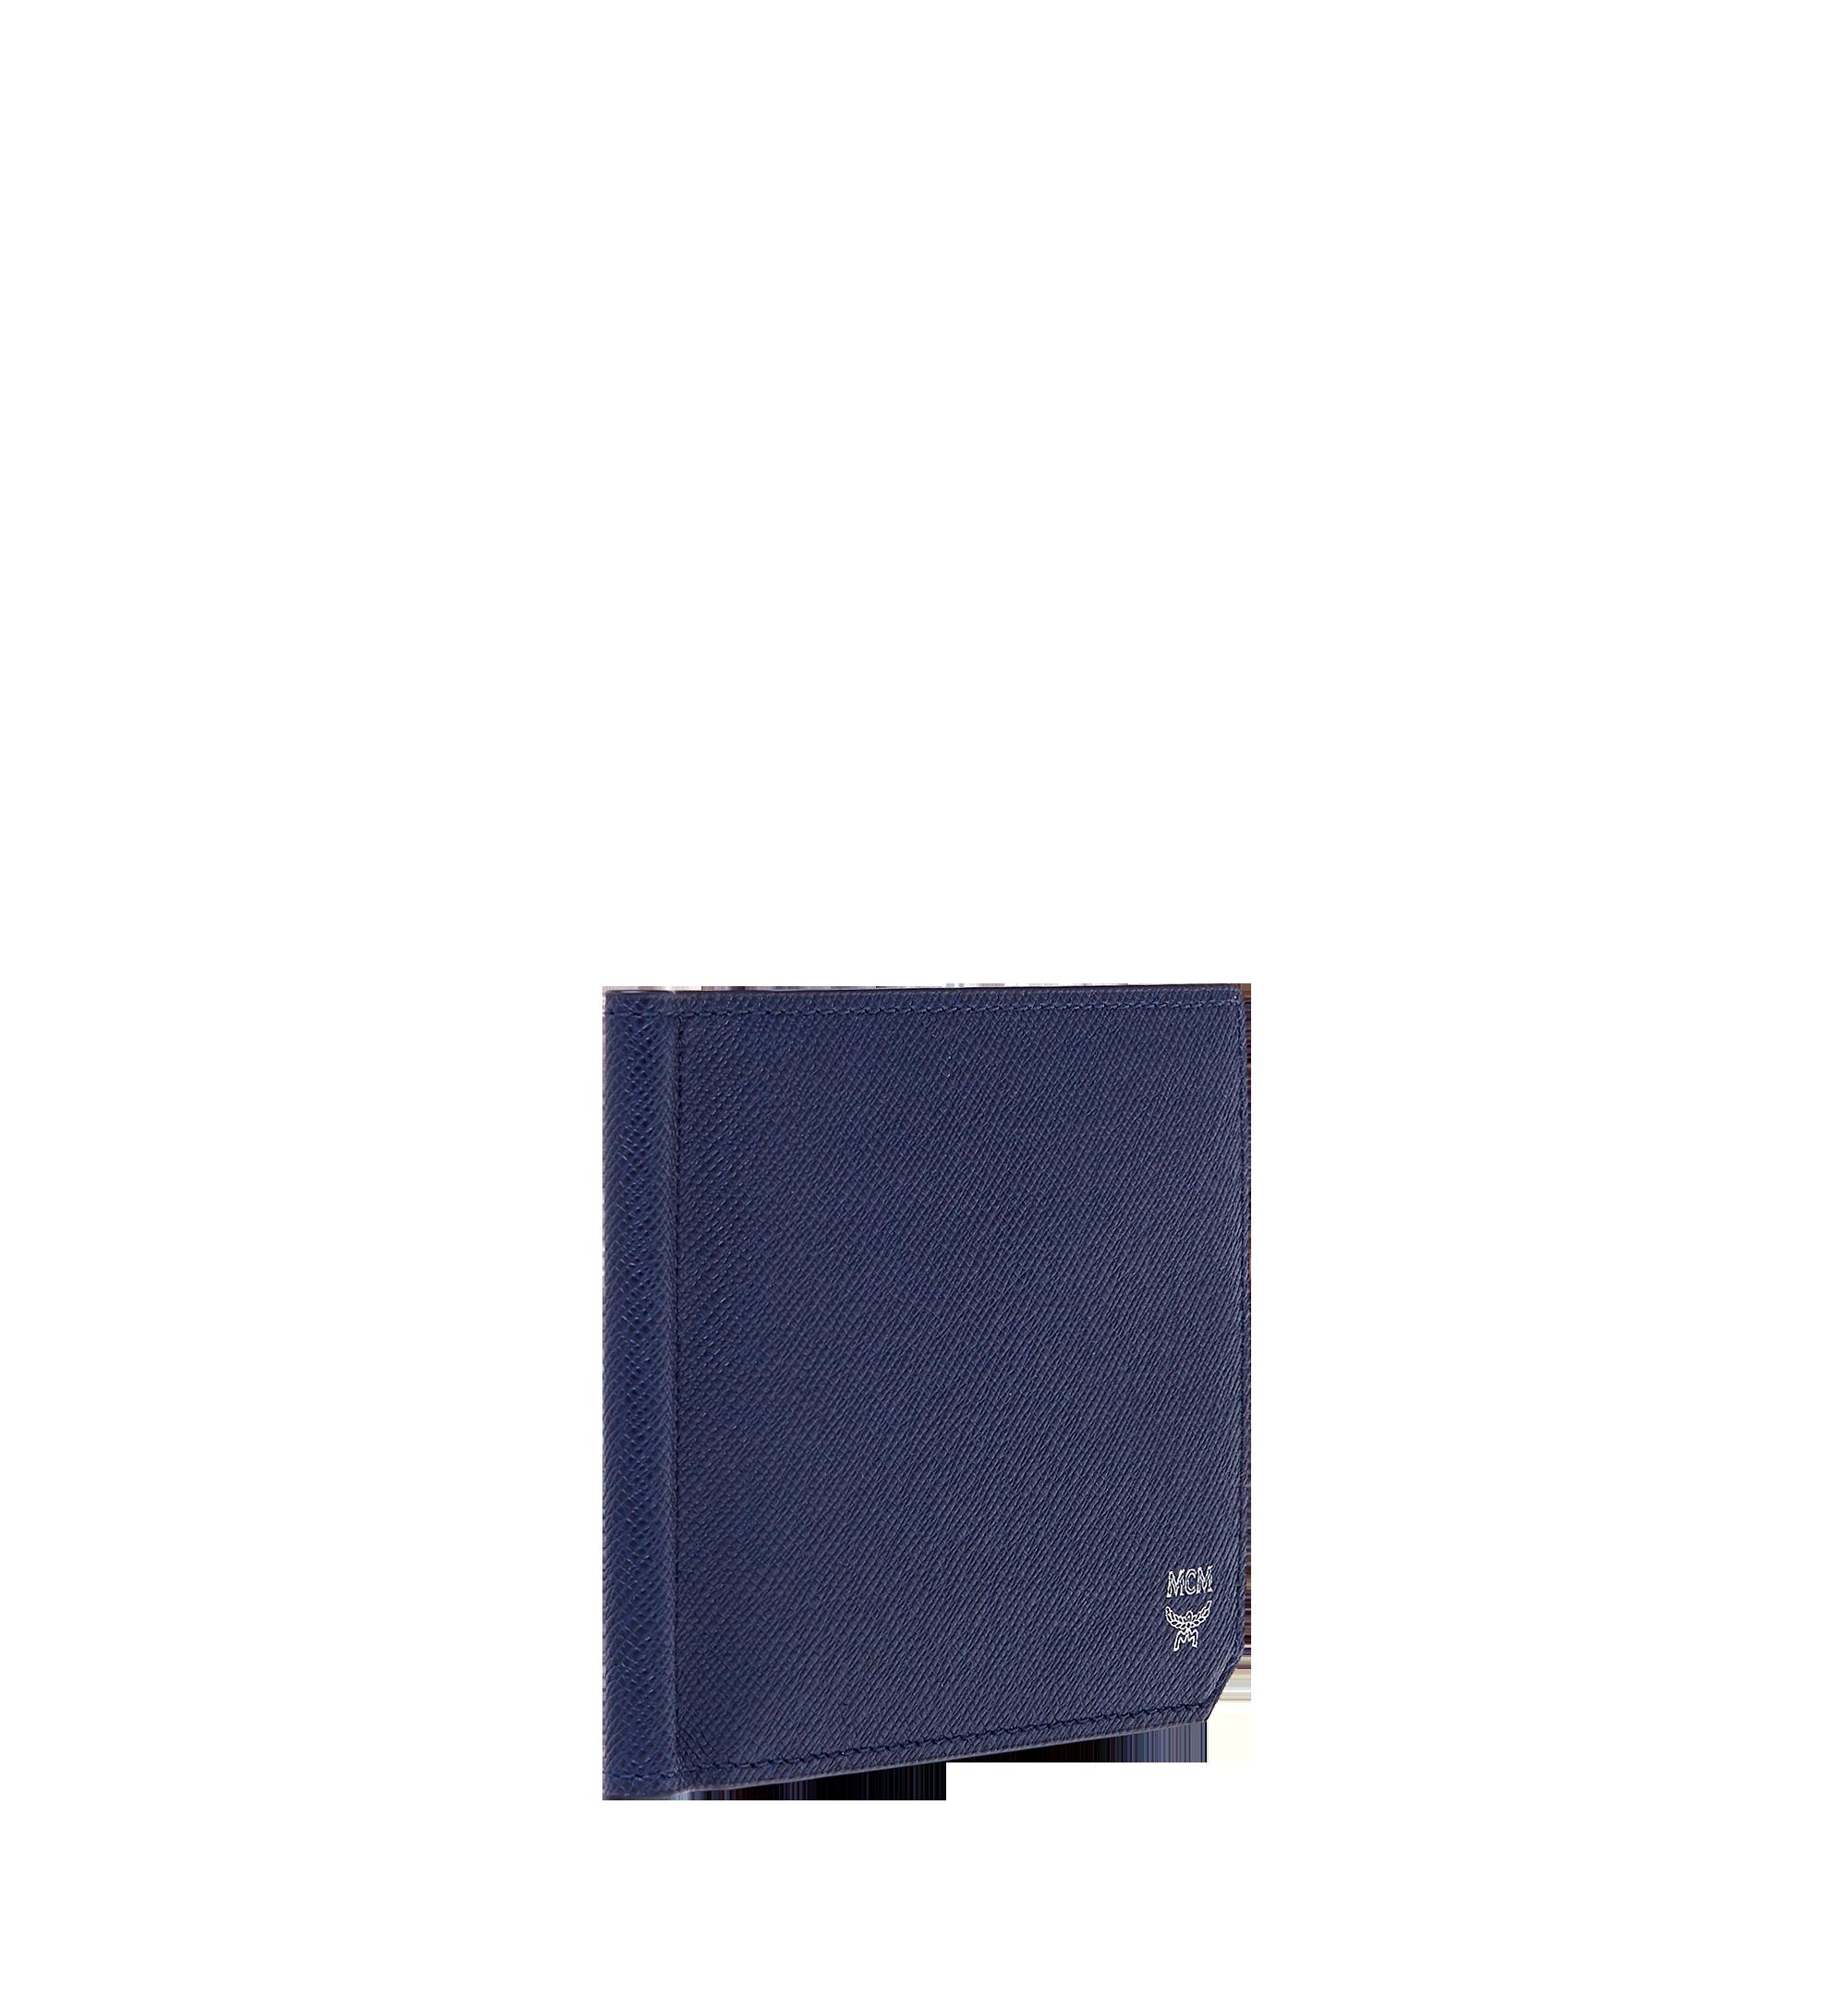 MCM New Bric 經典壓花皮革鈔票夾皮夾 Navy MXC8ALL45VY001 更多視圖 1